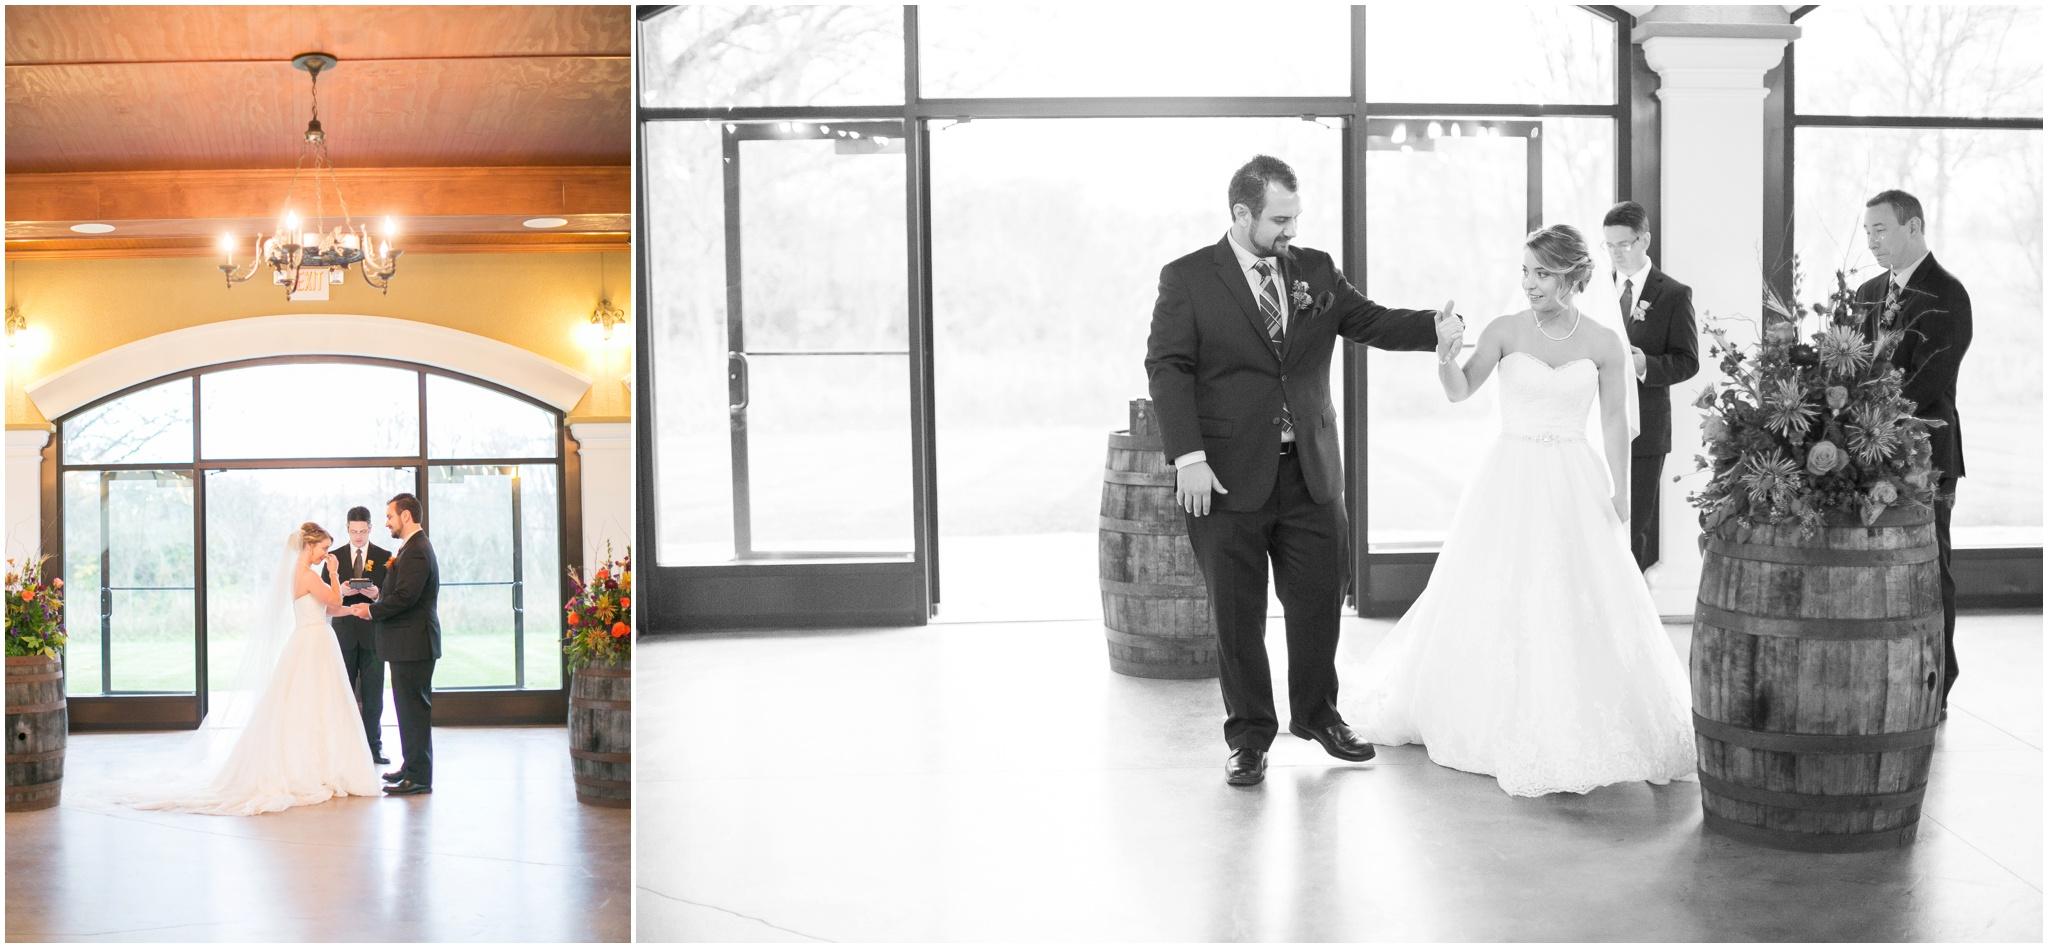 DC_Estate_Winery_Wedding_Beloit_Illinois_Wedding_0064.jpg